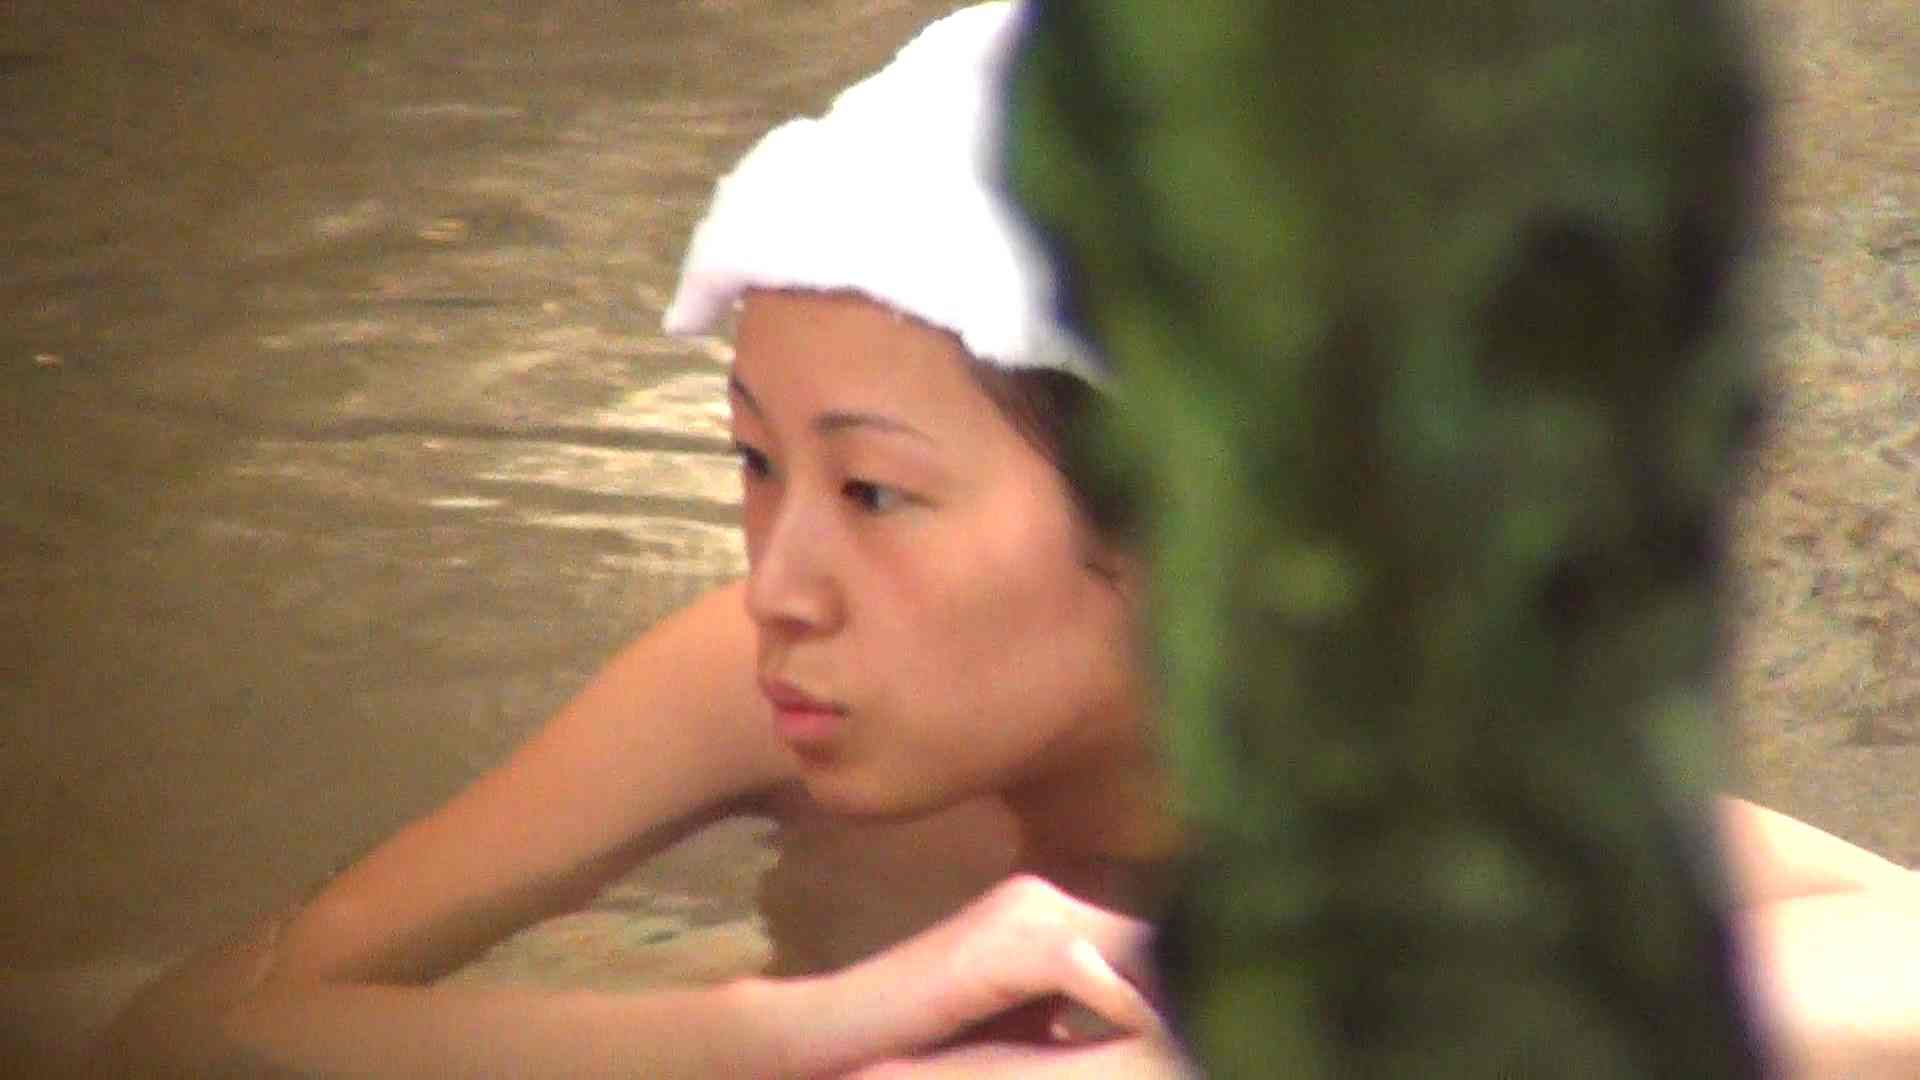 Vol.51 醤油j顔のお女市さん 胸の割りに下半身はがっちりタイプ 露天丸見え | 細身女性  79画像 36